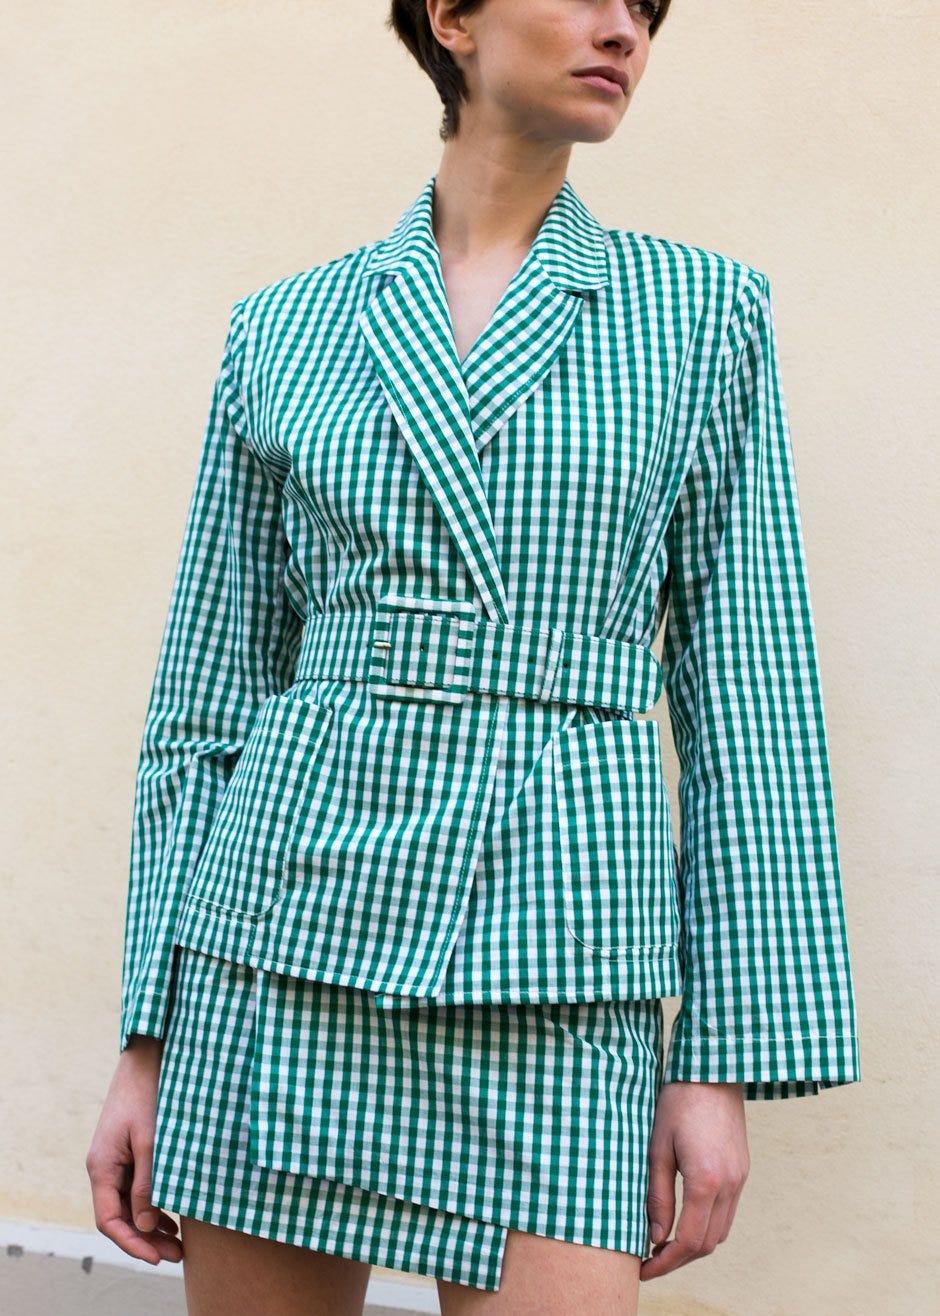 New Mini Skirt Suit Workwear Trend, Summer Trends 2018